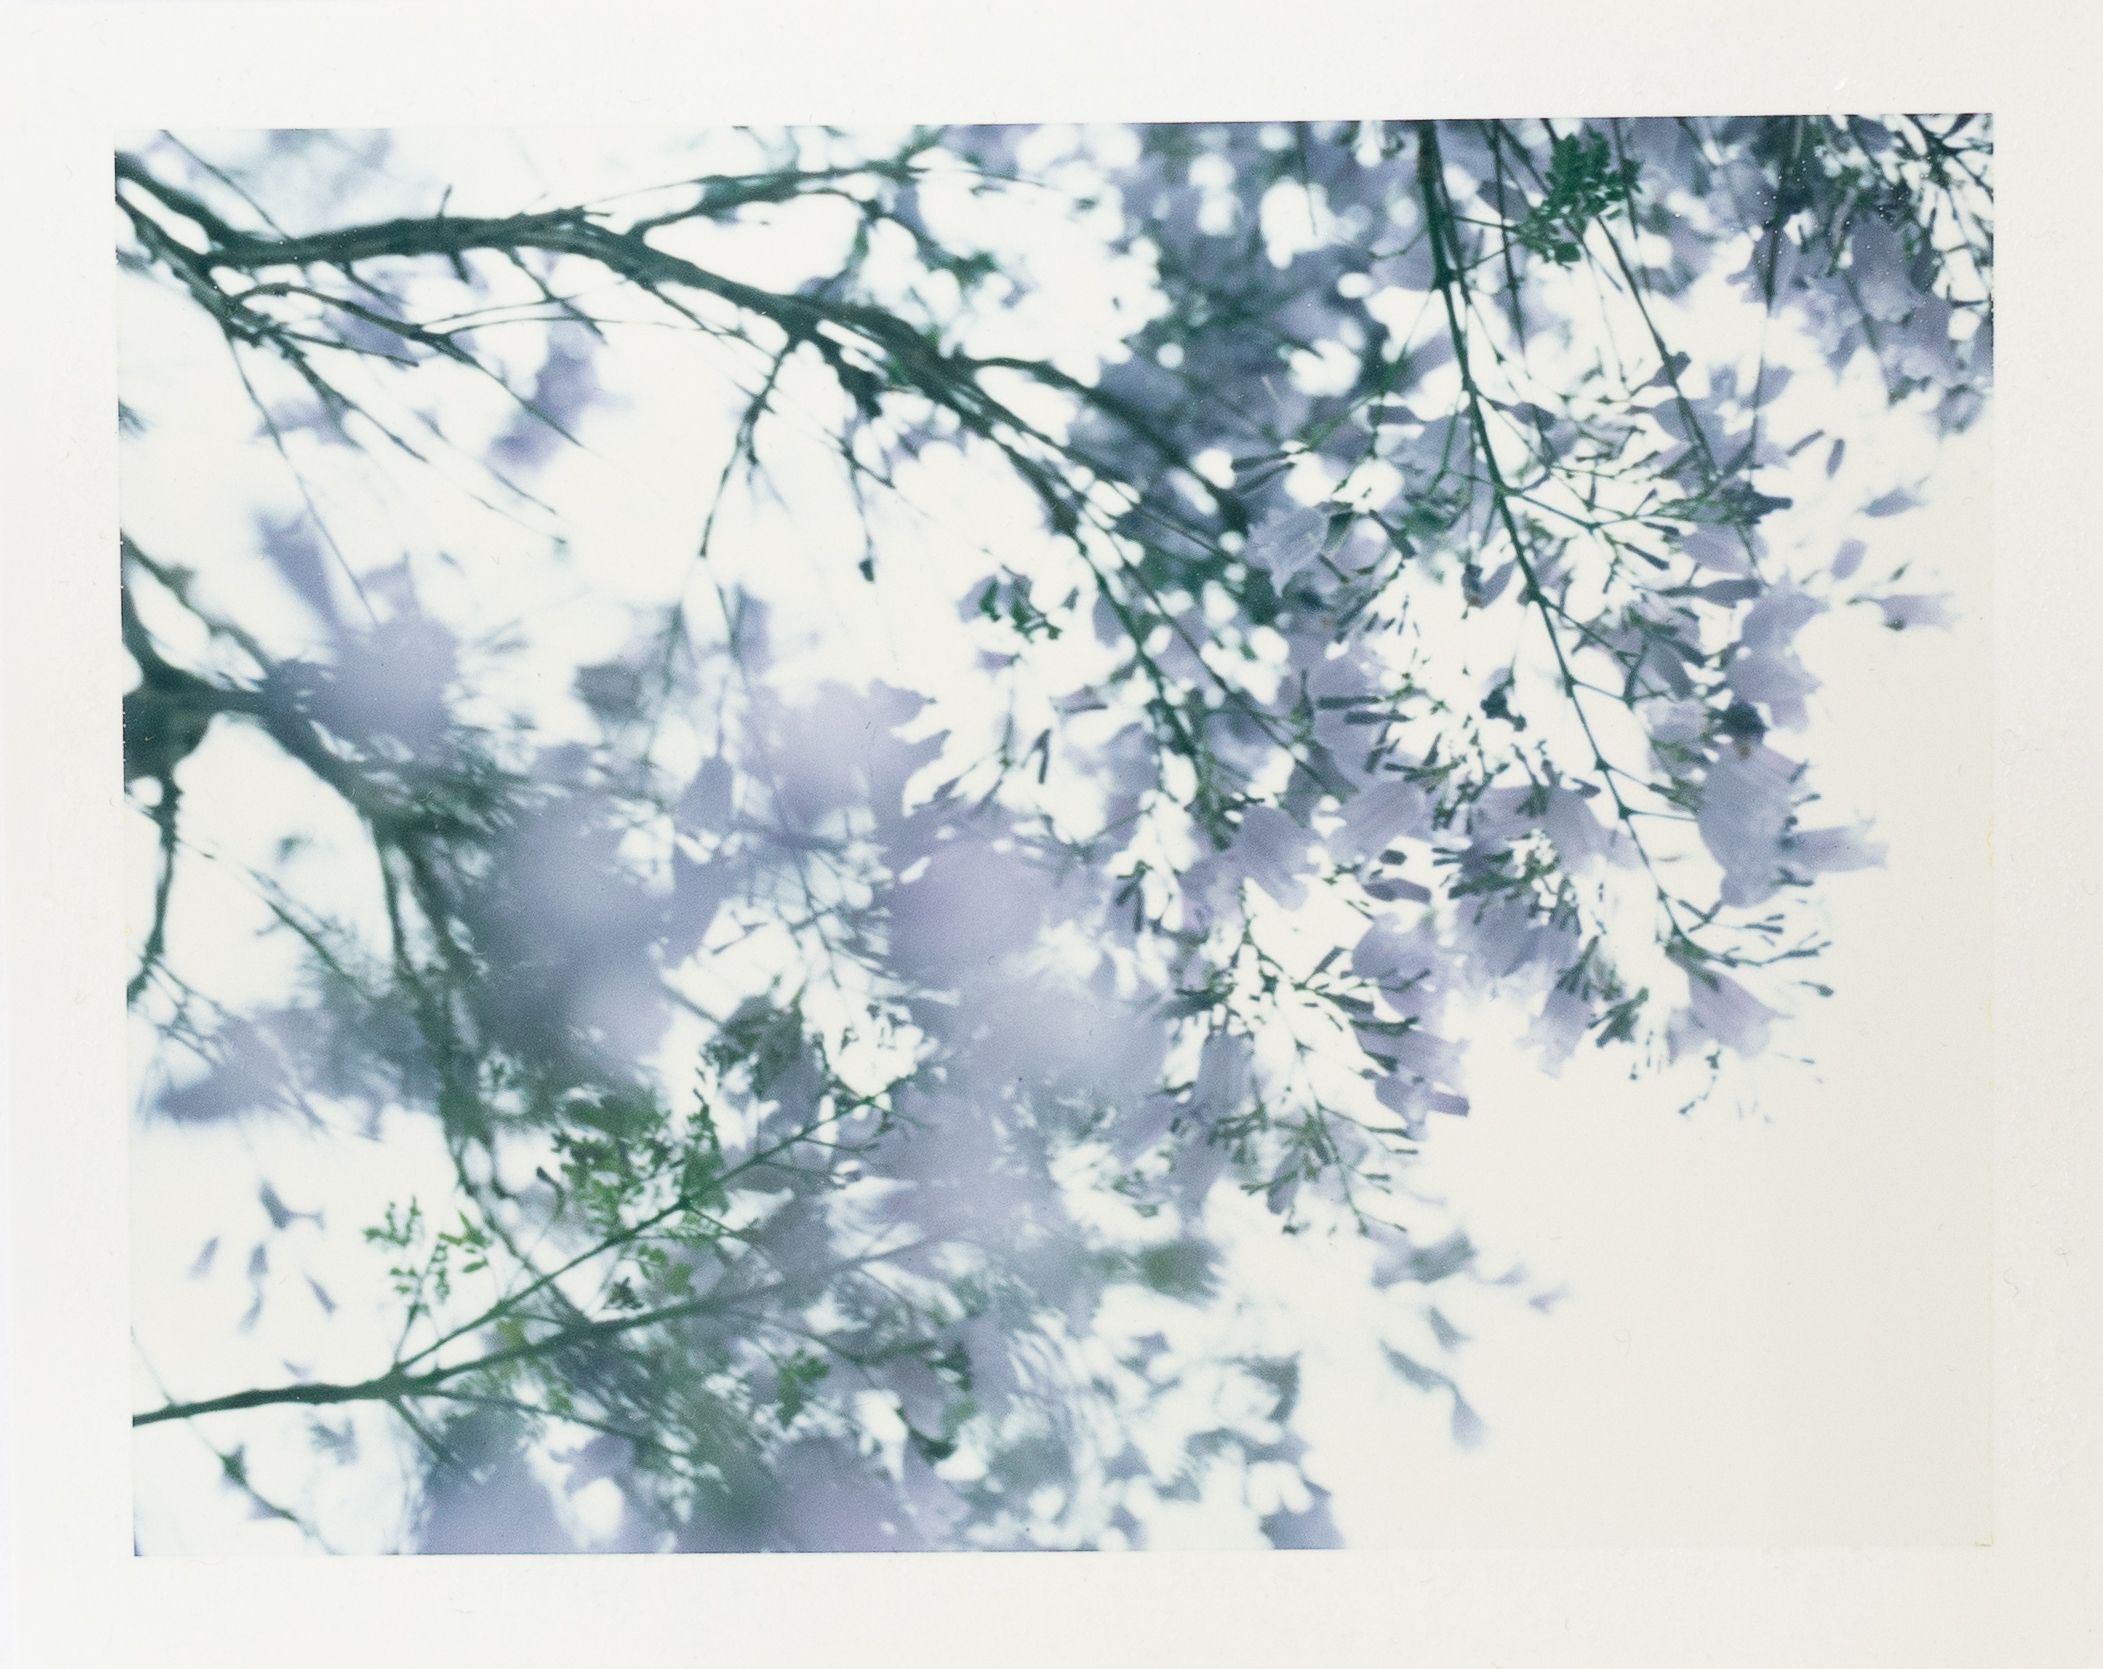 SlowContentStudio_Polaroid_Spring.jpg